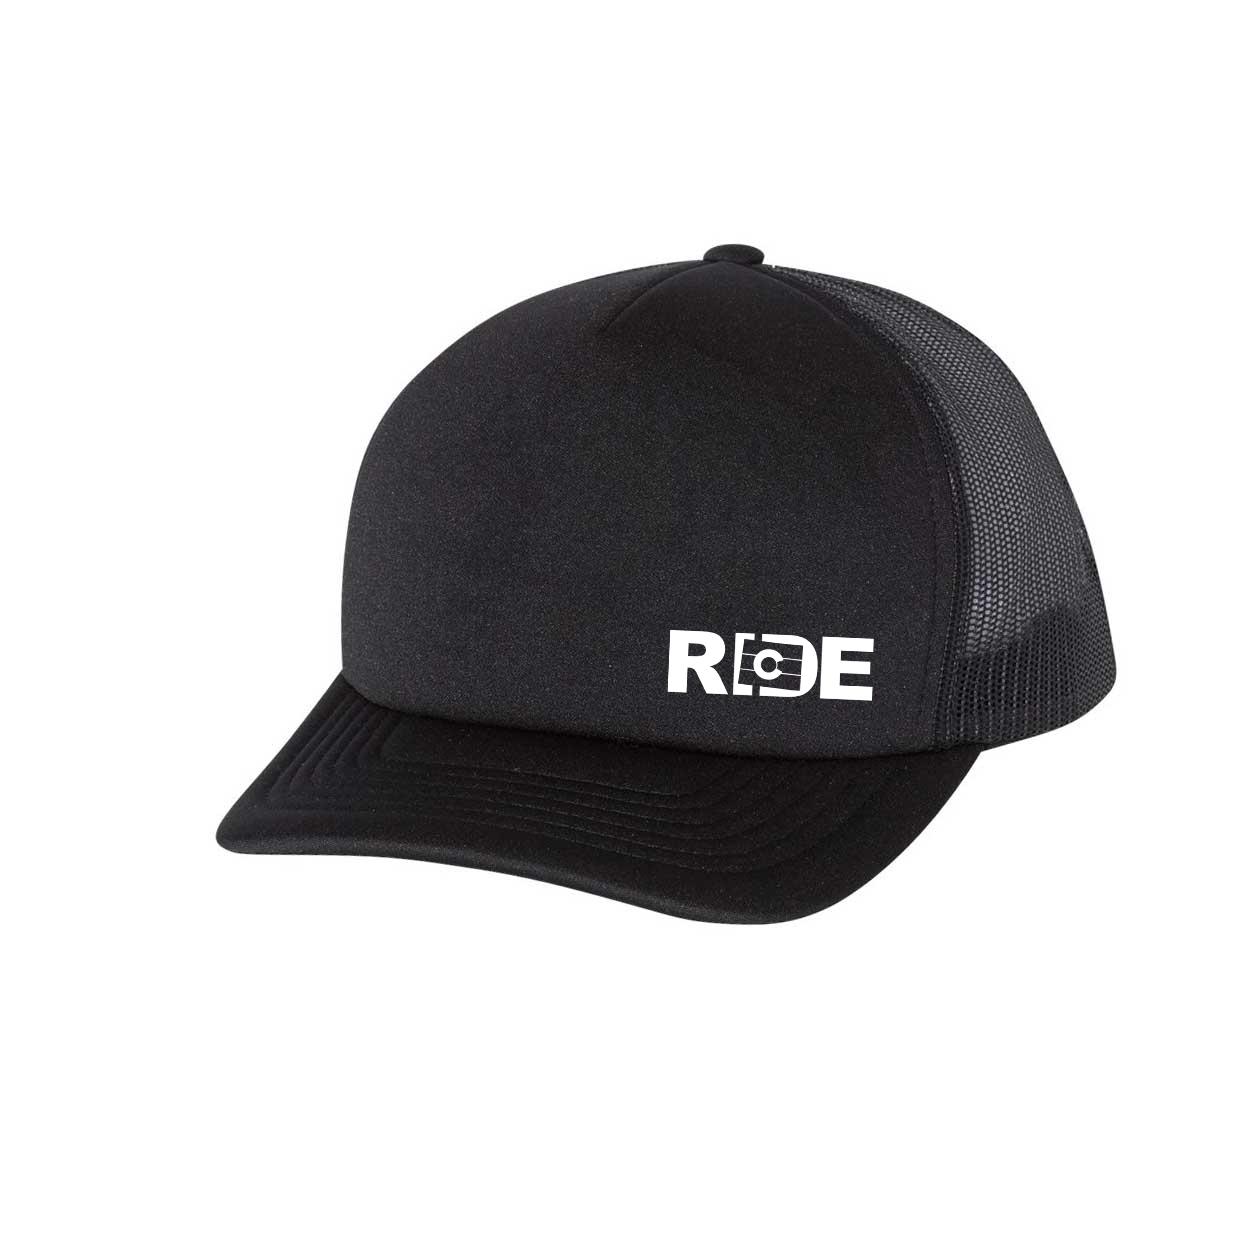 Ride Colorado Night Out Premium Foam Trucker Snapback Hat Black (White Logo)